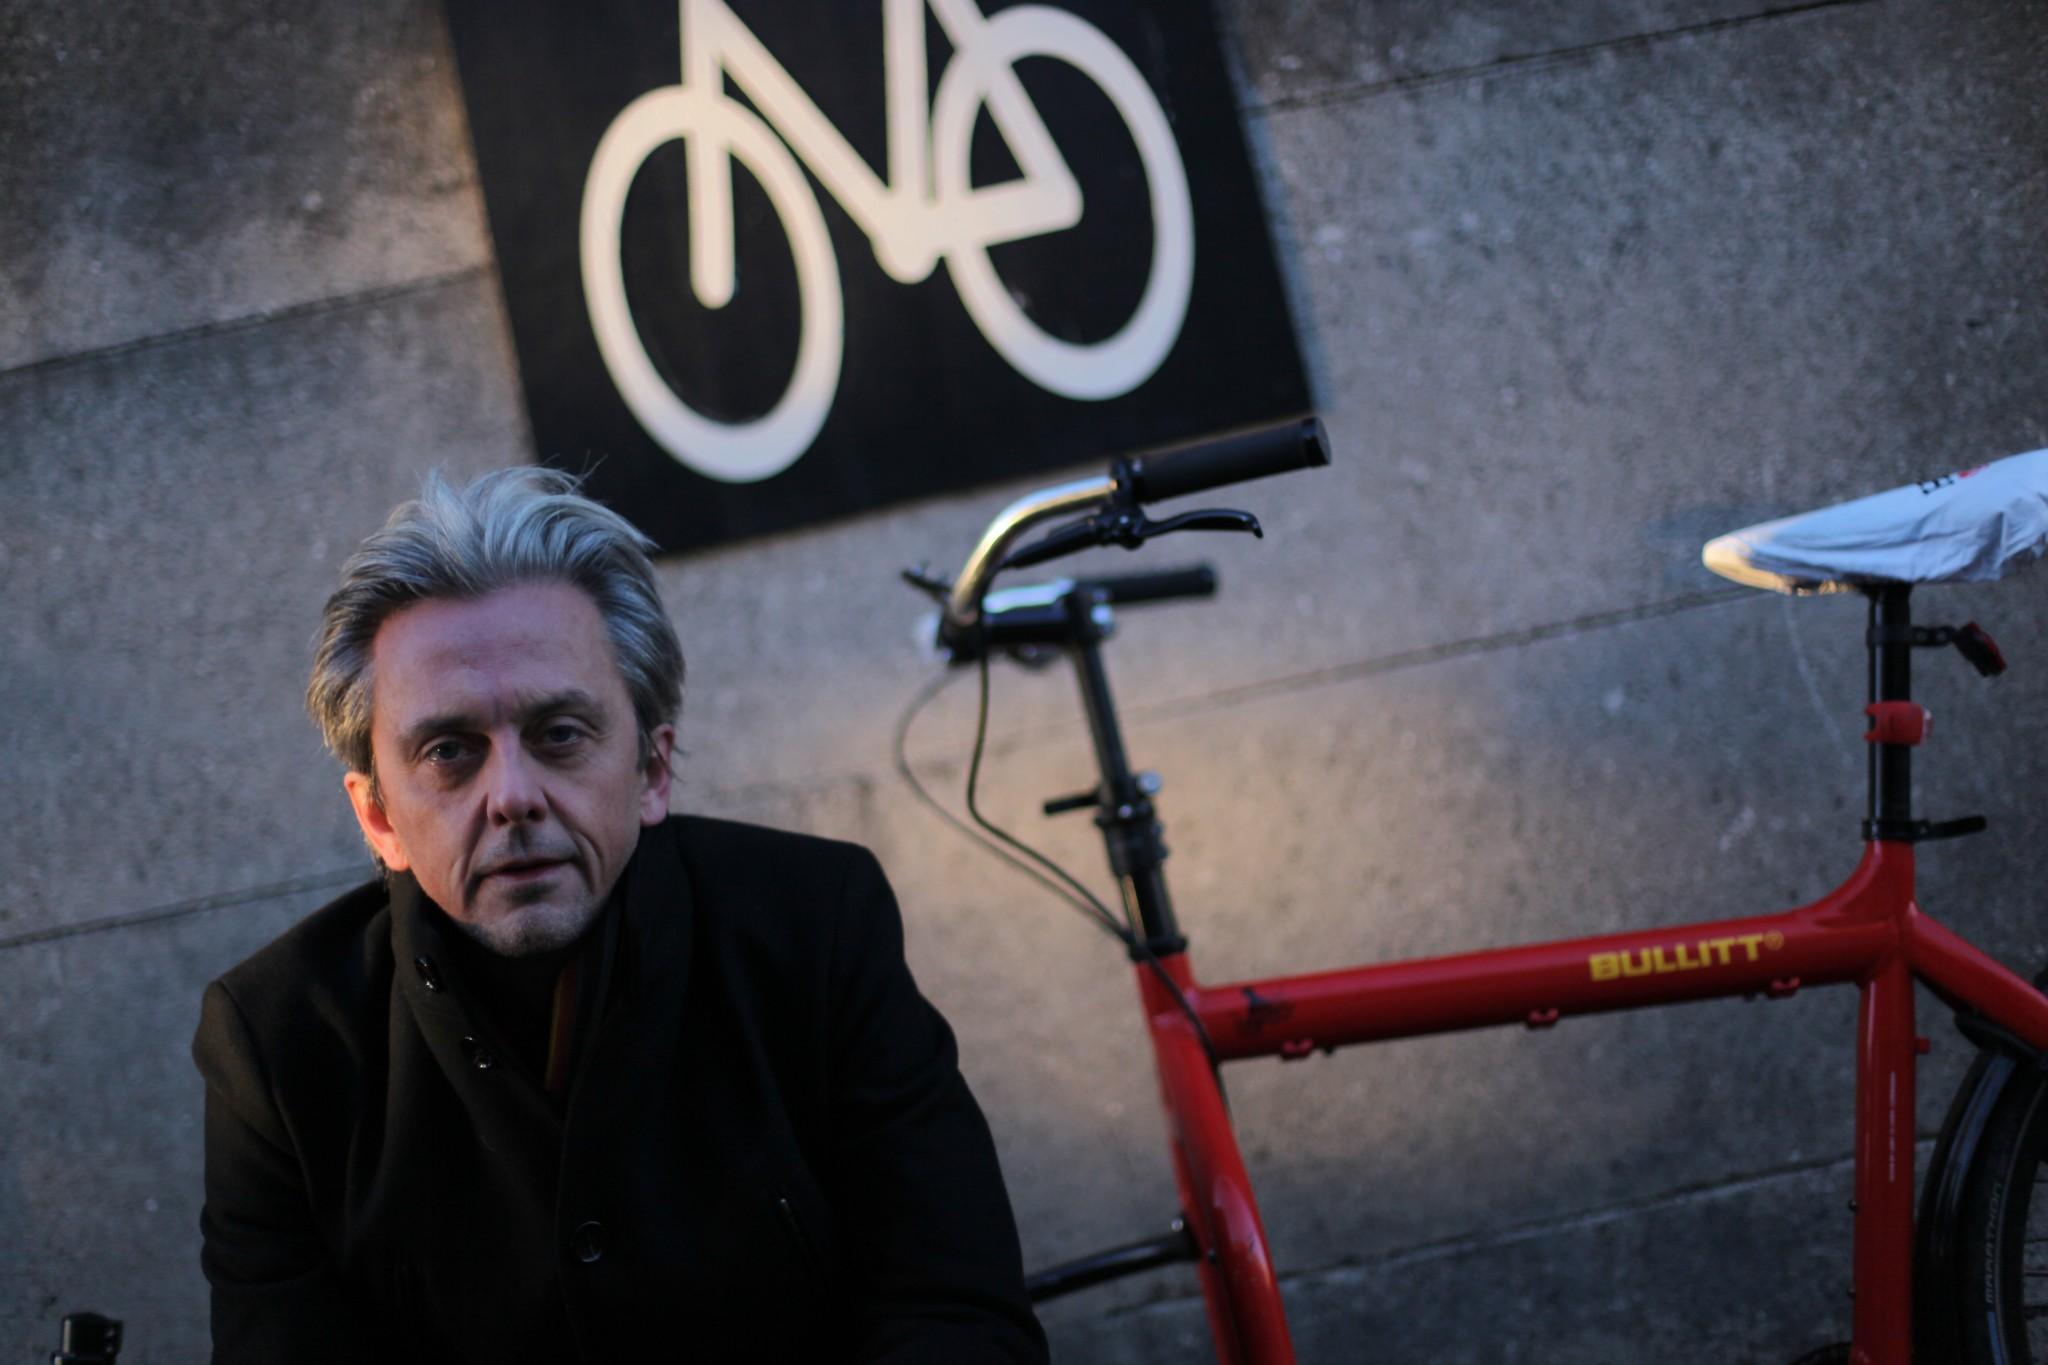 Mikael Colville-Andersen (Bild: Copenhagenize. Oli Broom)